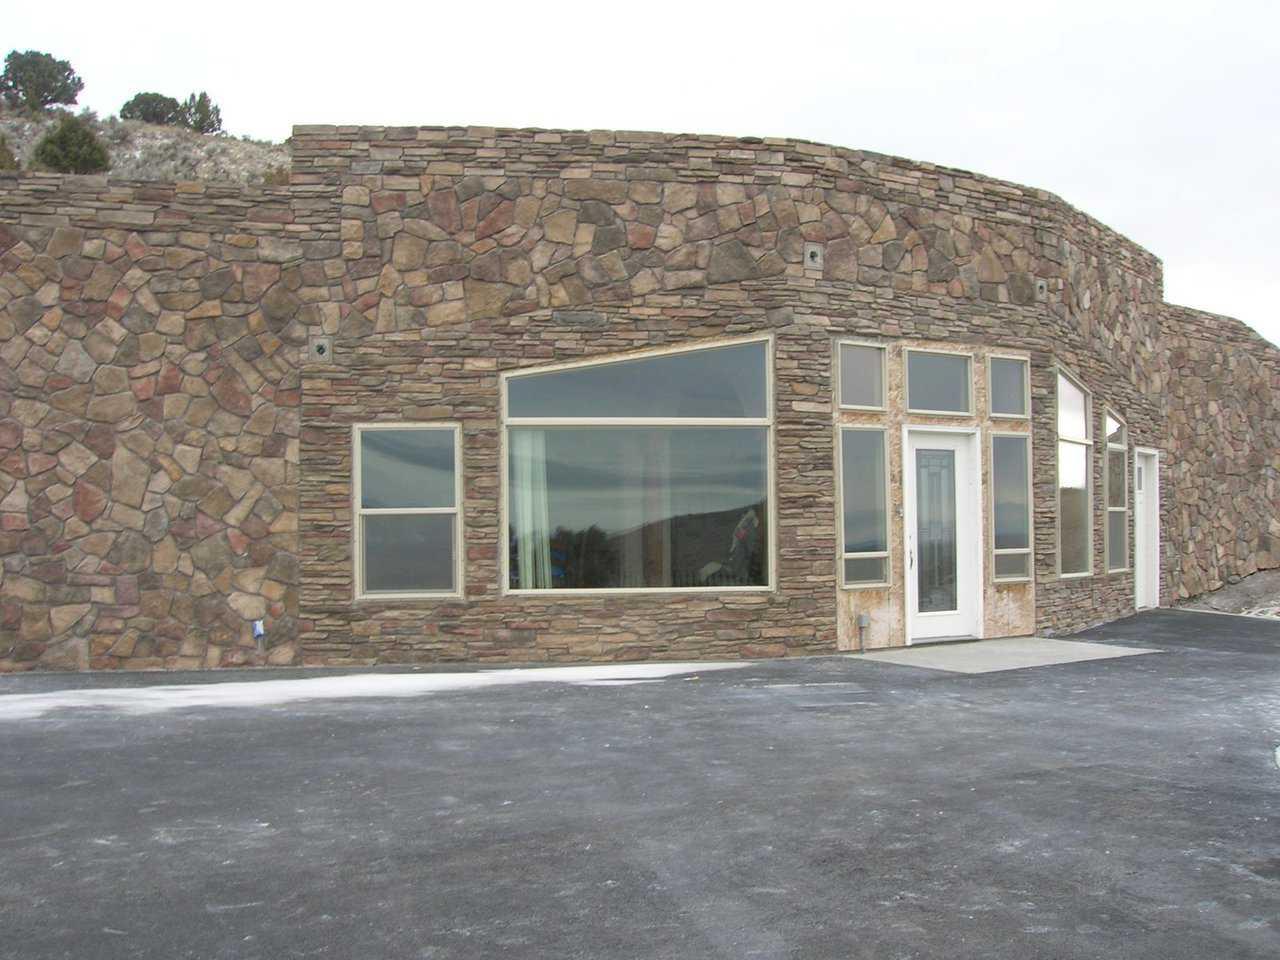 Earth bermed nature friendly energy efficient monolithic for Earth bermed homes